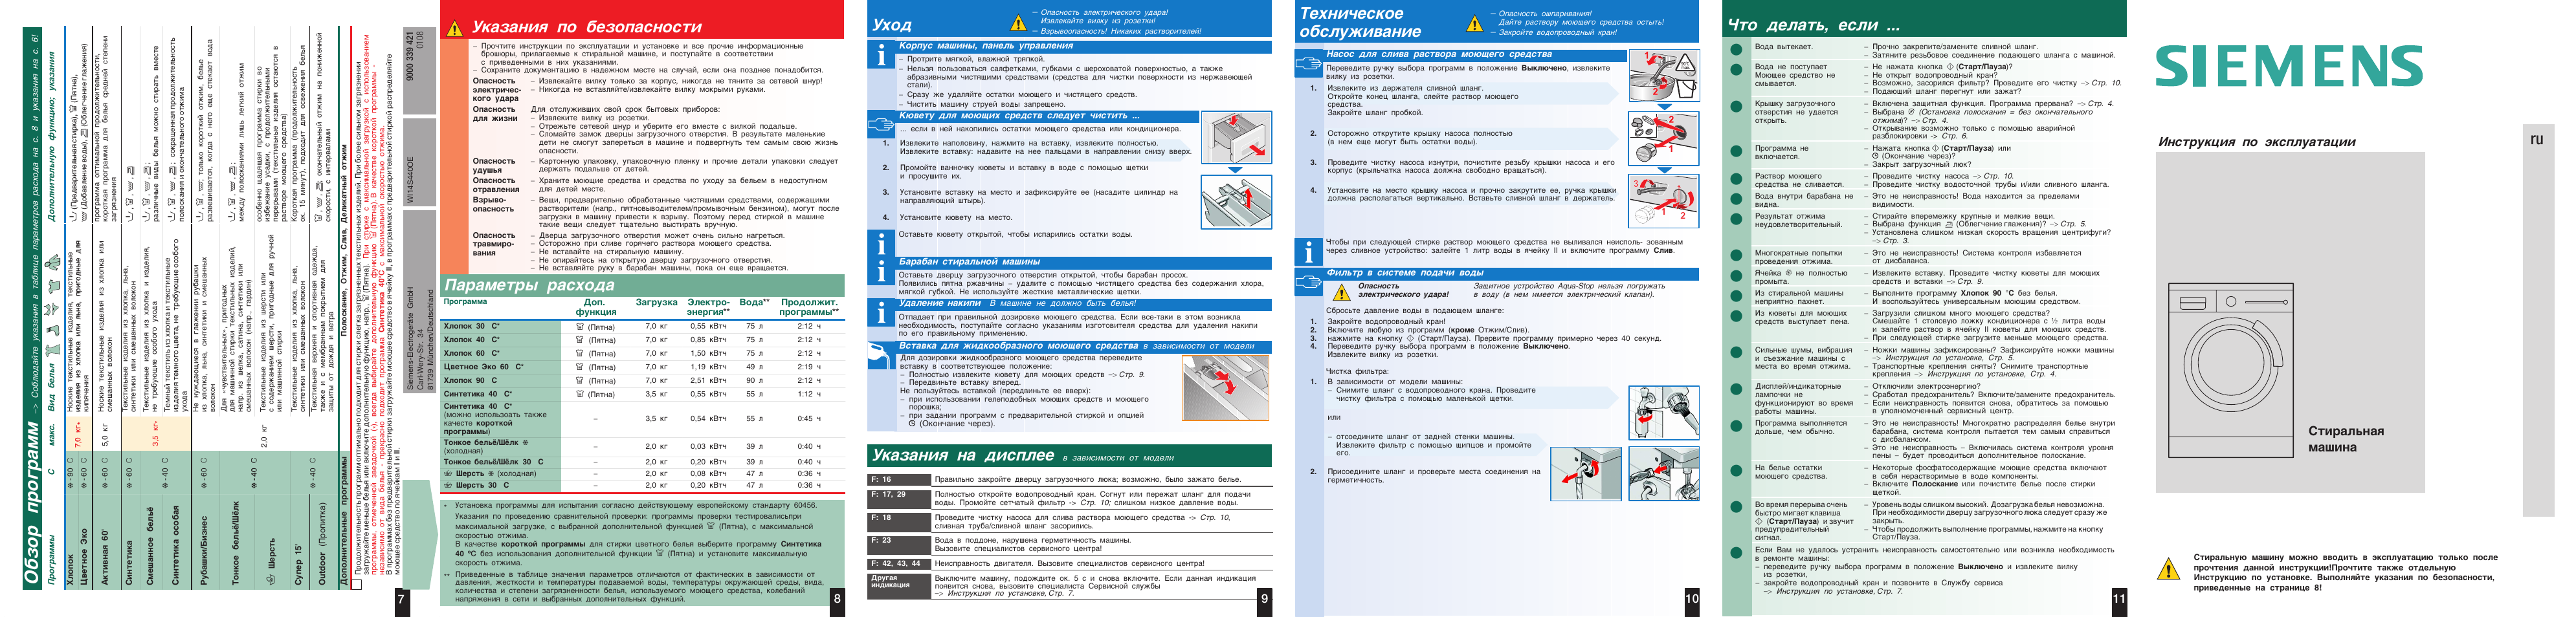 Siemens, Стиральная, Машина Инструкция по эксплуатации Siemens WI14S440OE Страница 2 / 8